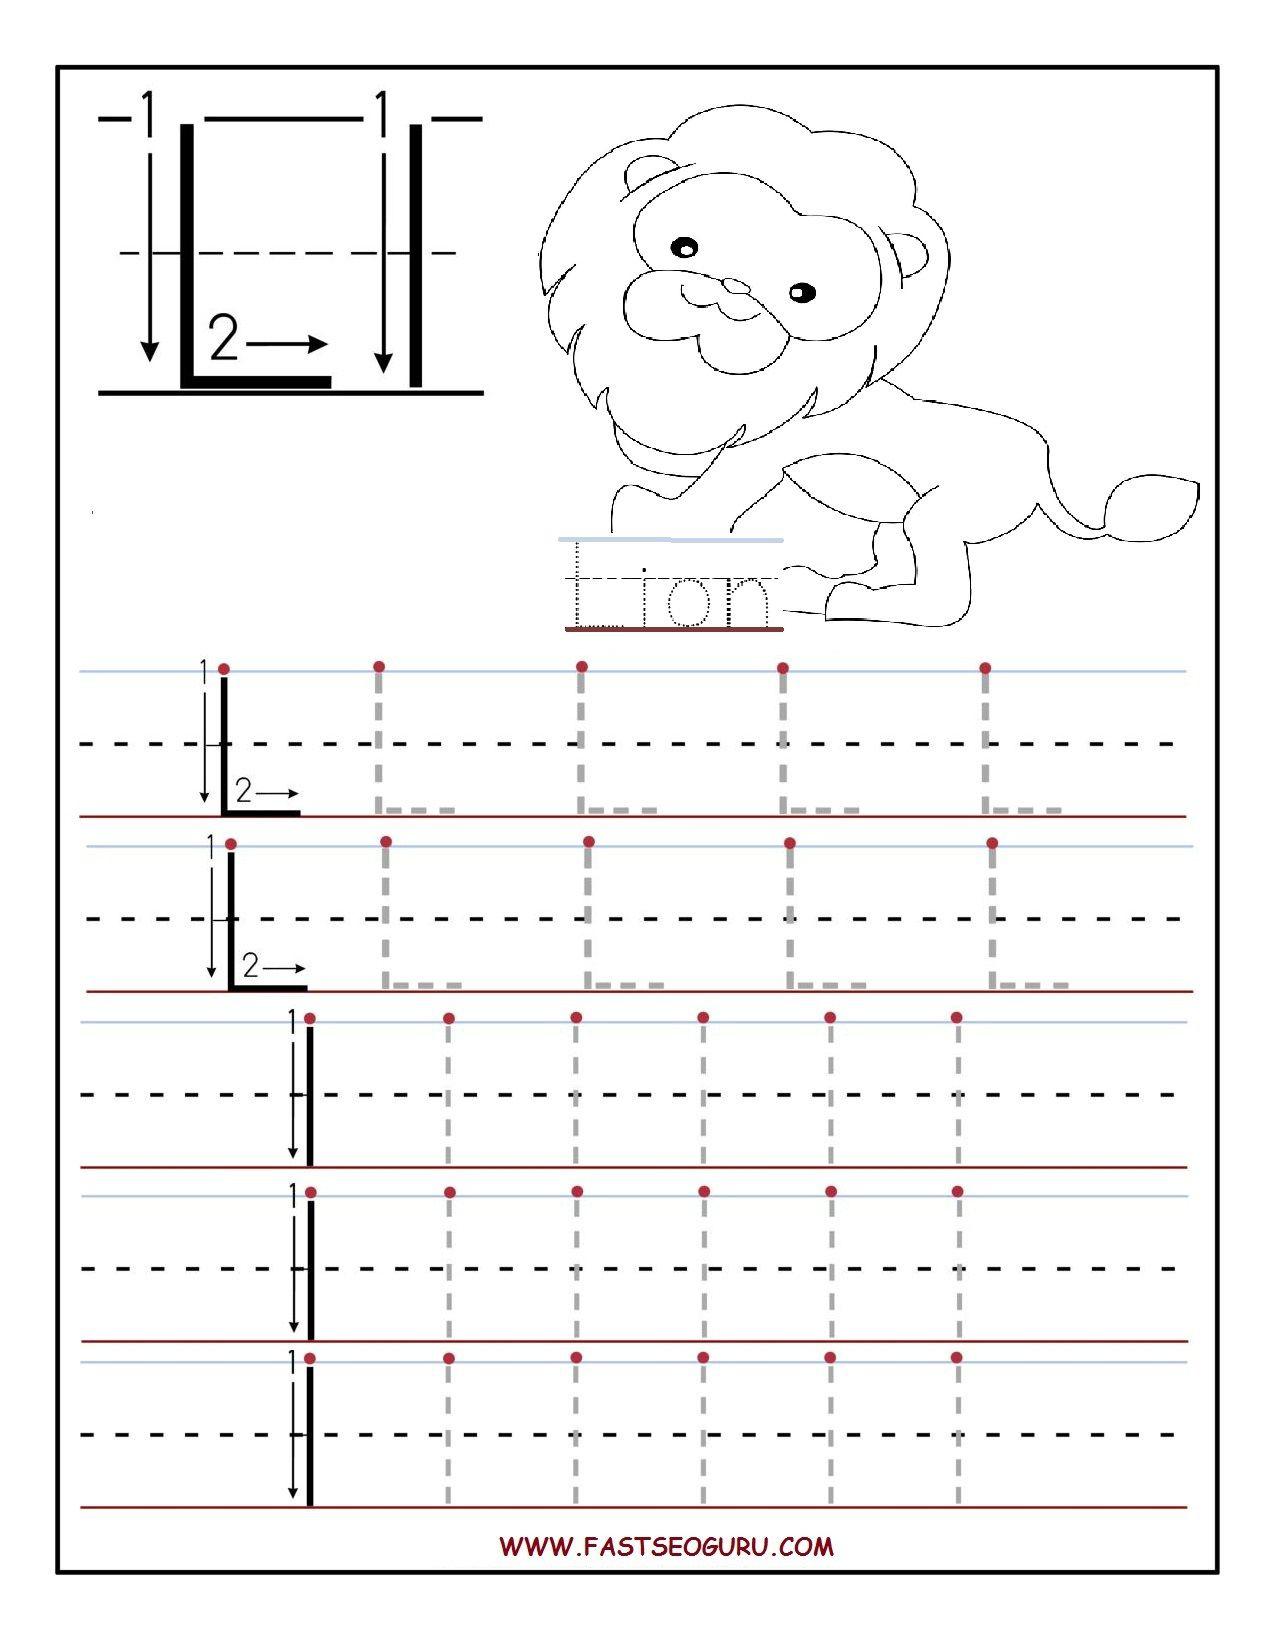 Printable Letter L Tracing Worksheets For Preschool for Letter L Tracing Preschool